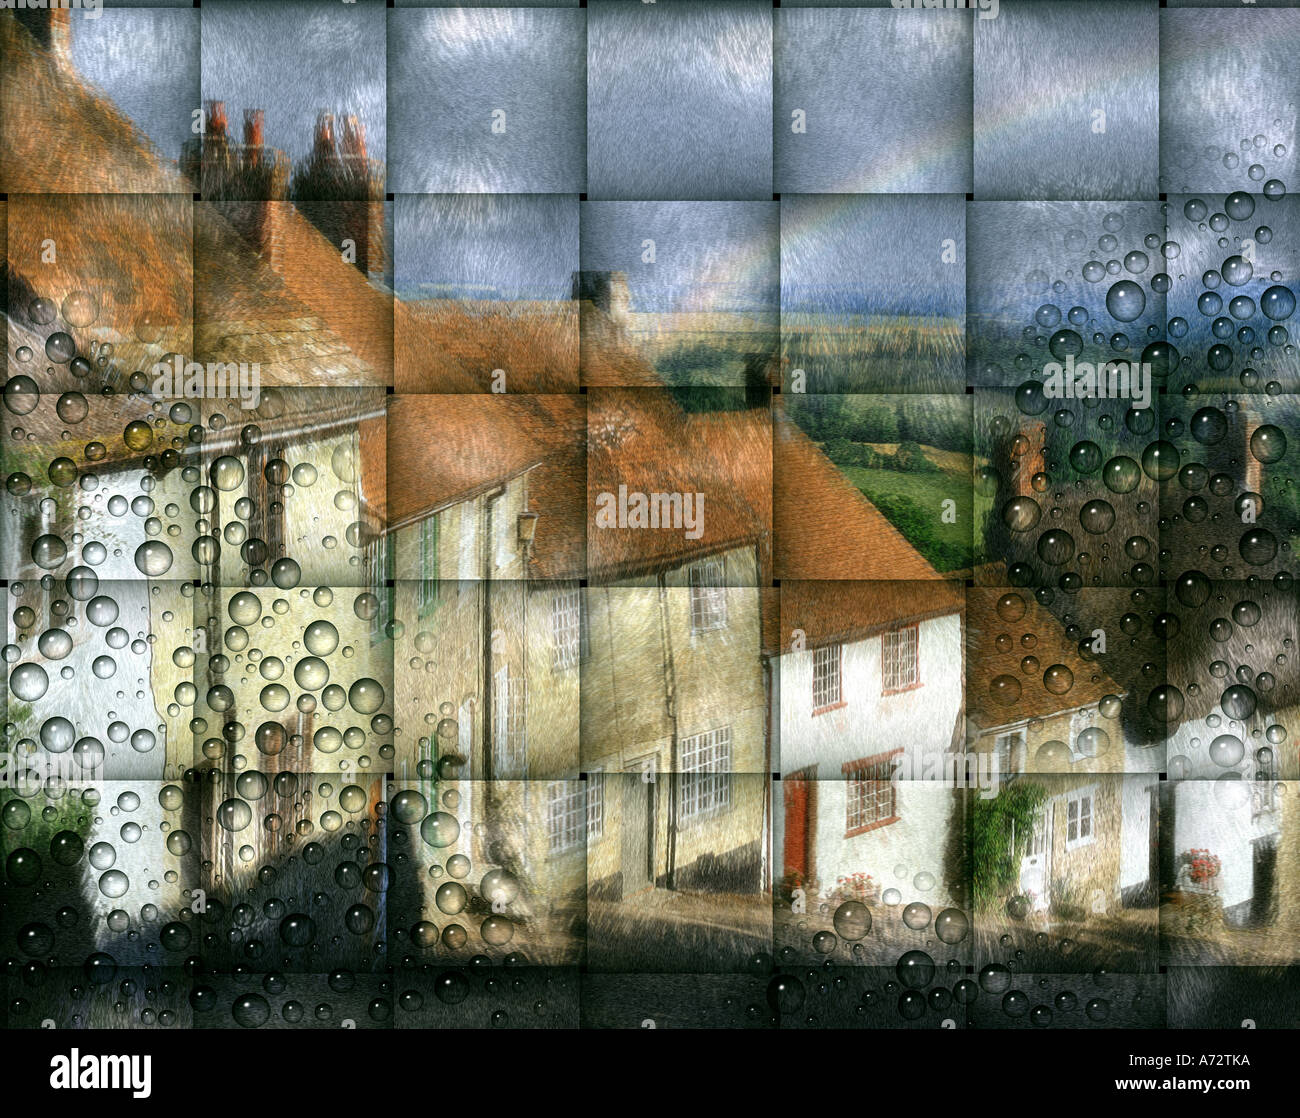 GB - DORSET:  Gold Hill at Shaftesbury (Digital Art) - Stock Image